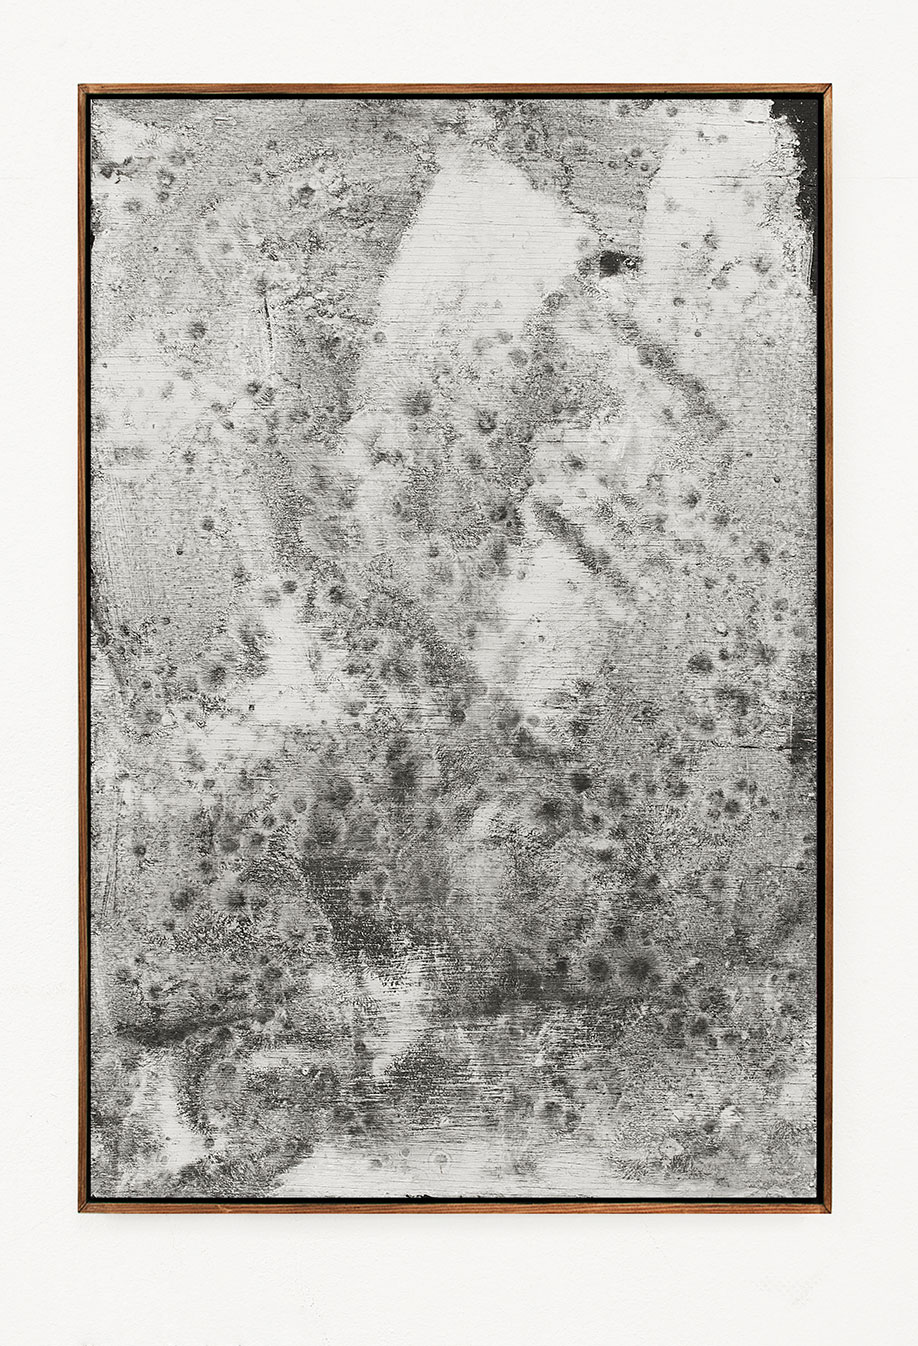 <b>Title:&nbsp;</b>Conversations Rain Ability<br /><b>Year:&nbsp;</b>2012<br /><b>Medium:&nbsp;</b>Chalk and blackboard paint on plywood<br /><b>Size:&nbsp;</b>59 x 39 cm